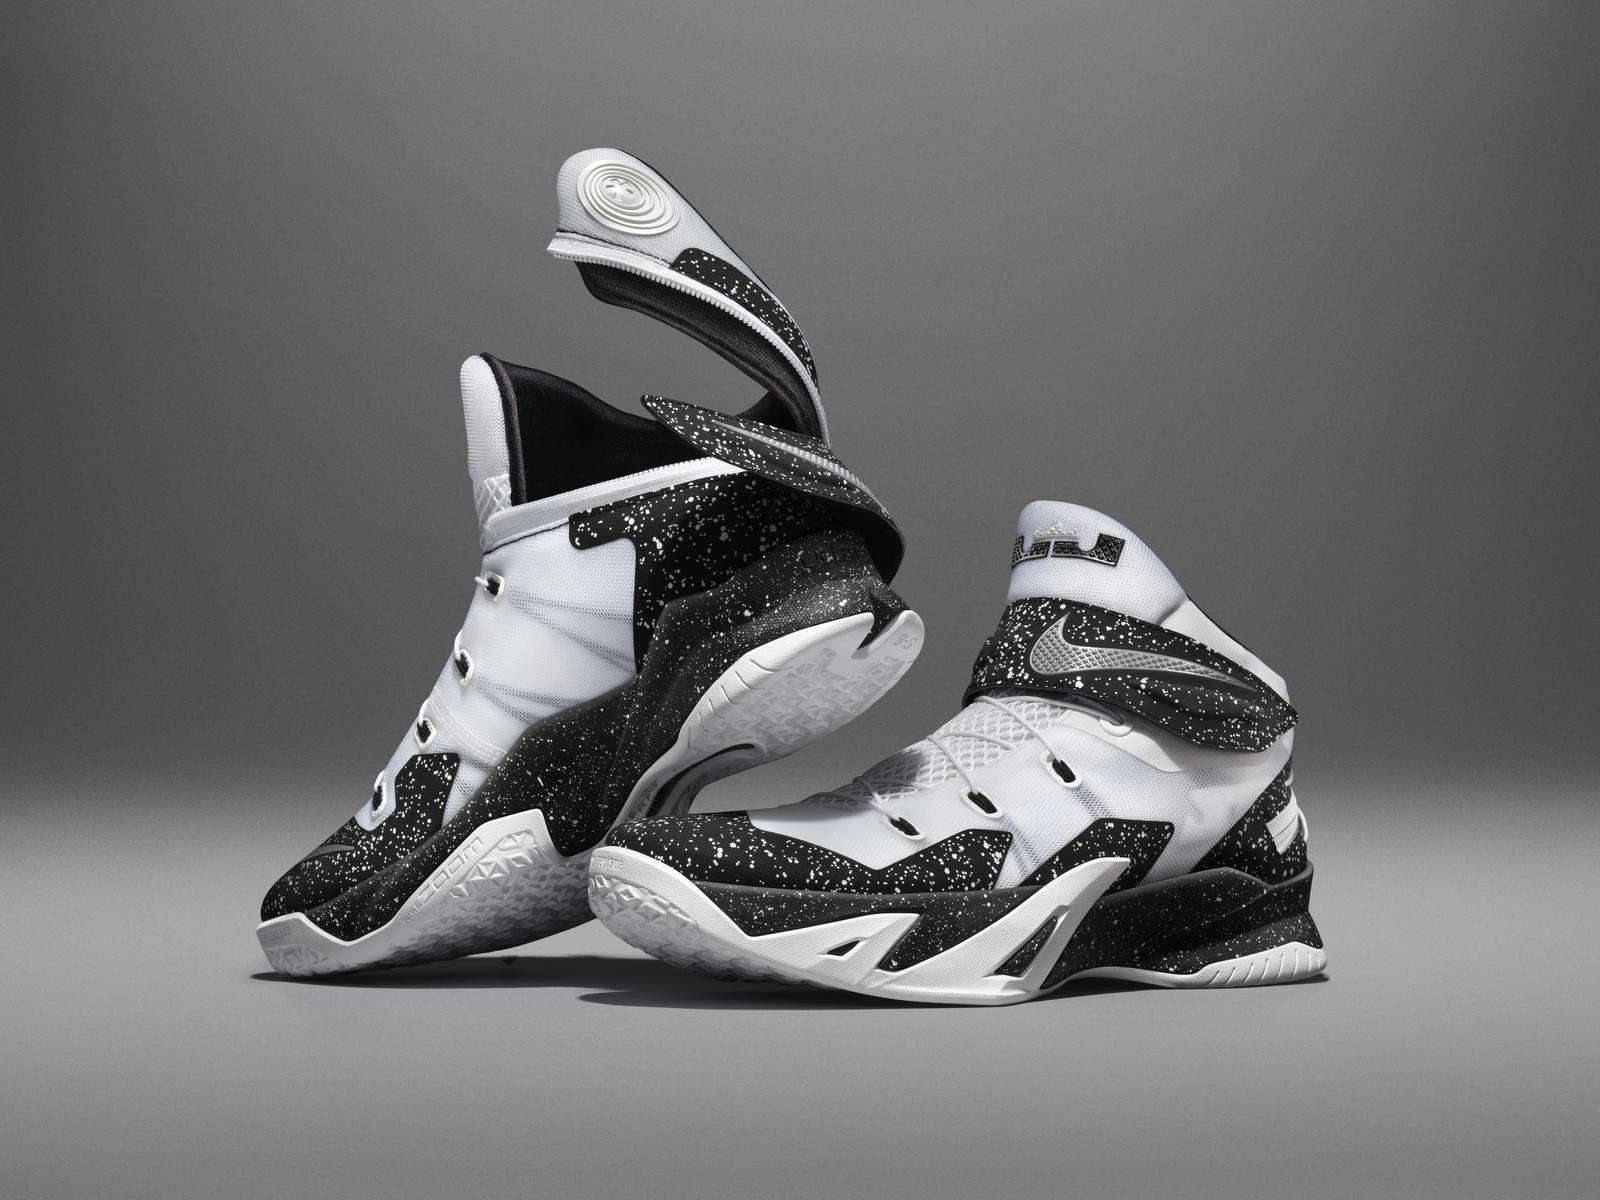 Nike Unwraps FlyEase For Kids - Nike News